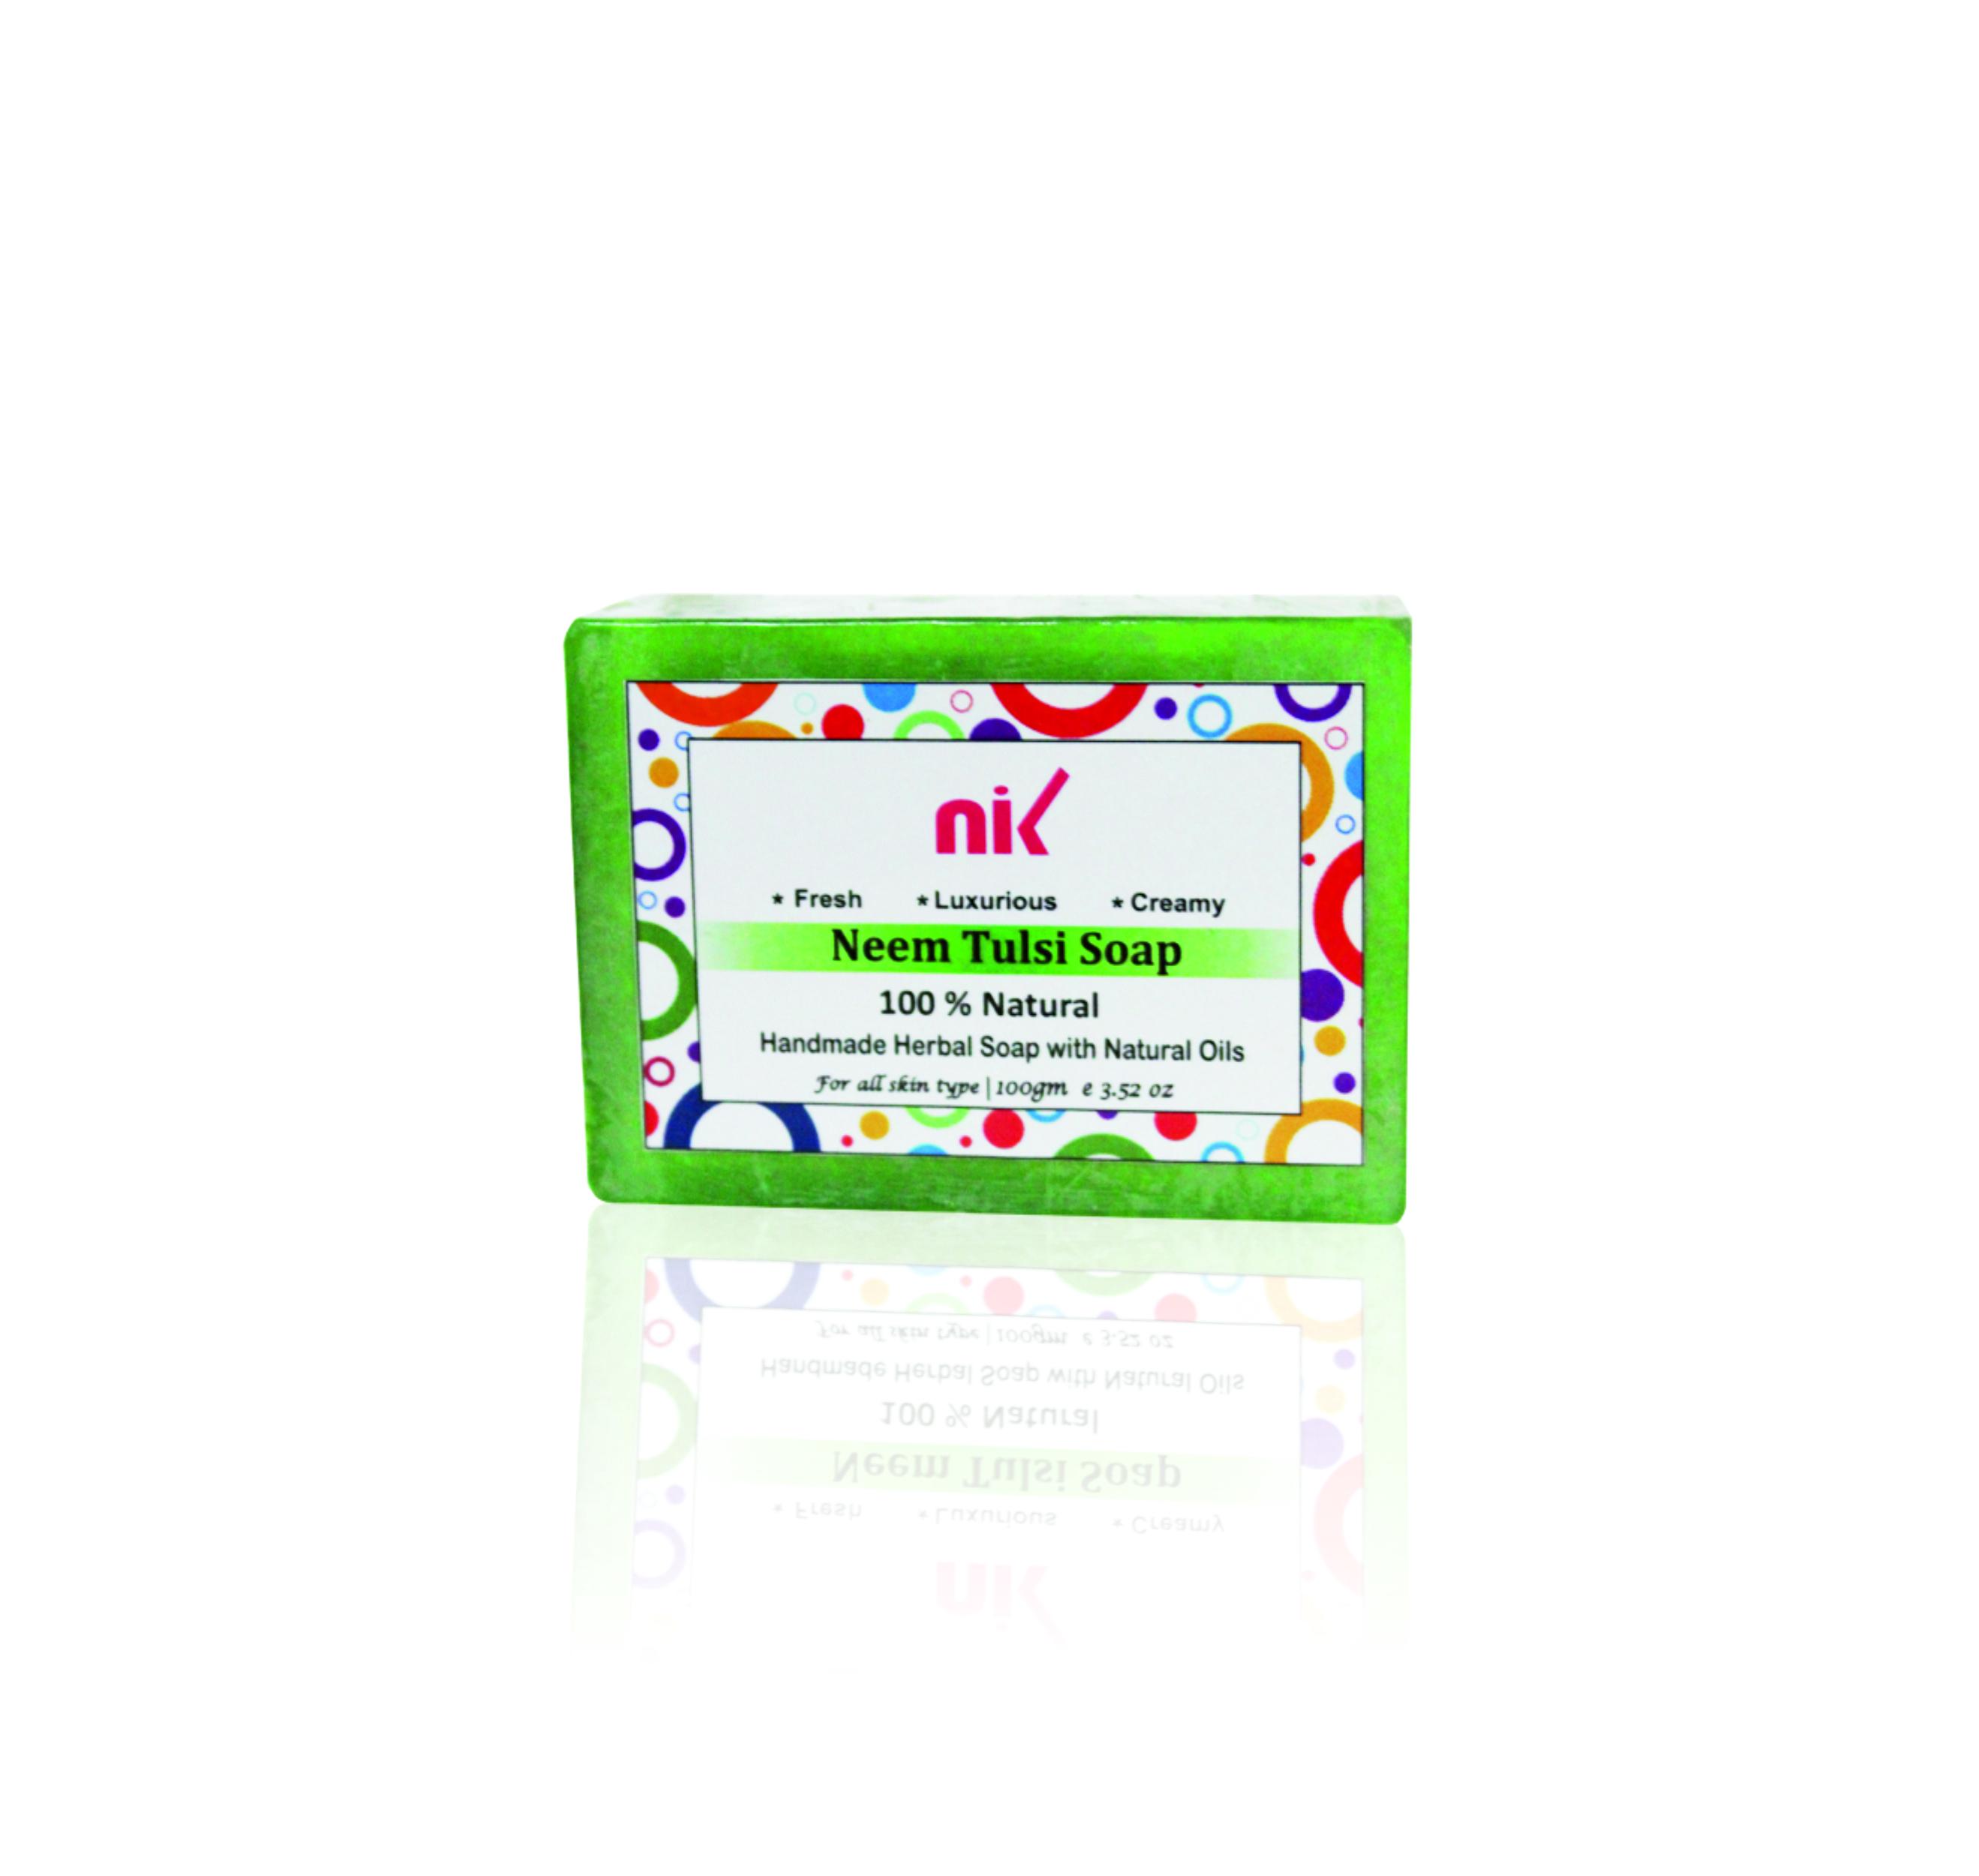 Neem Tulsi Handmade Soap